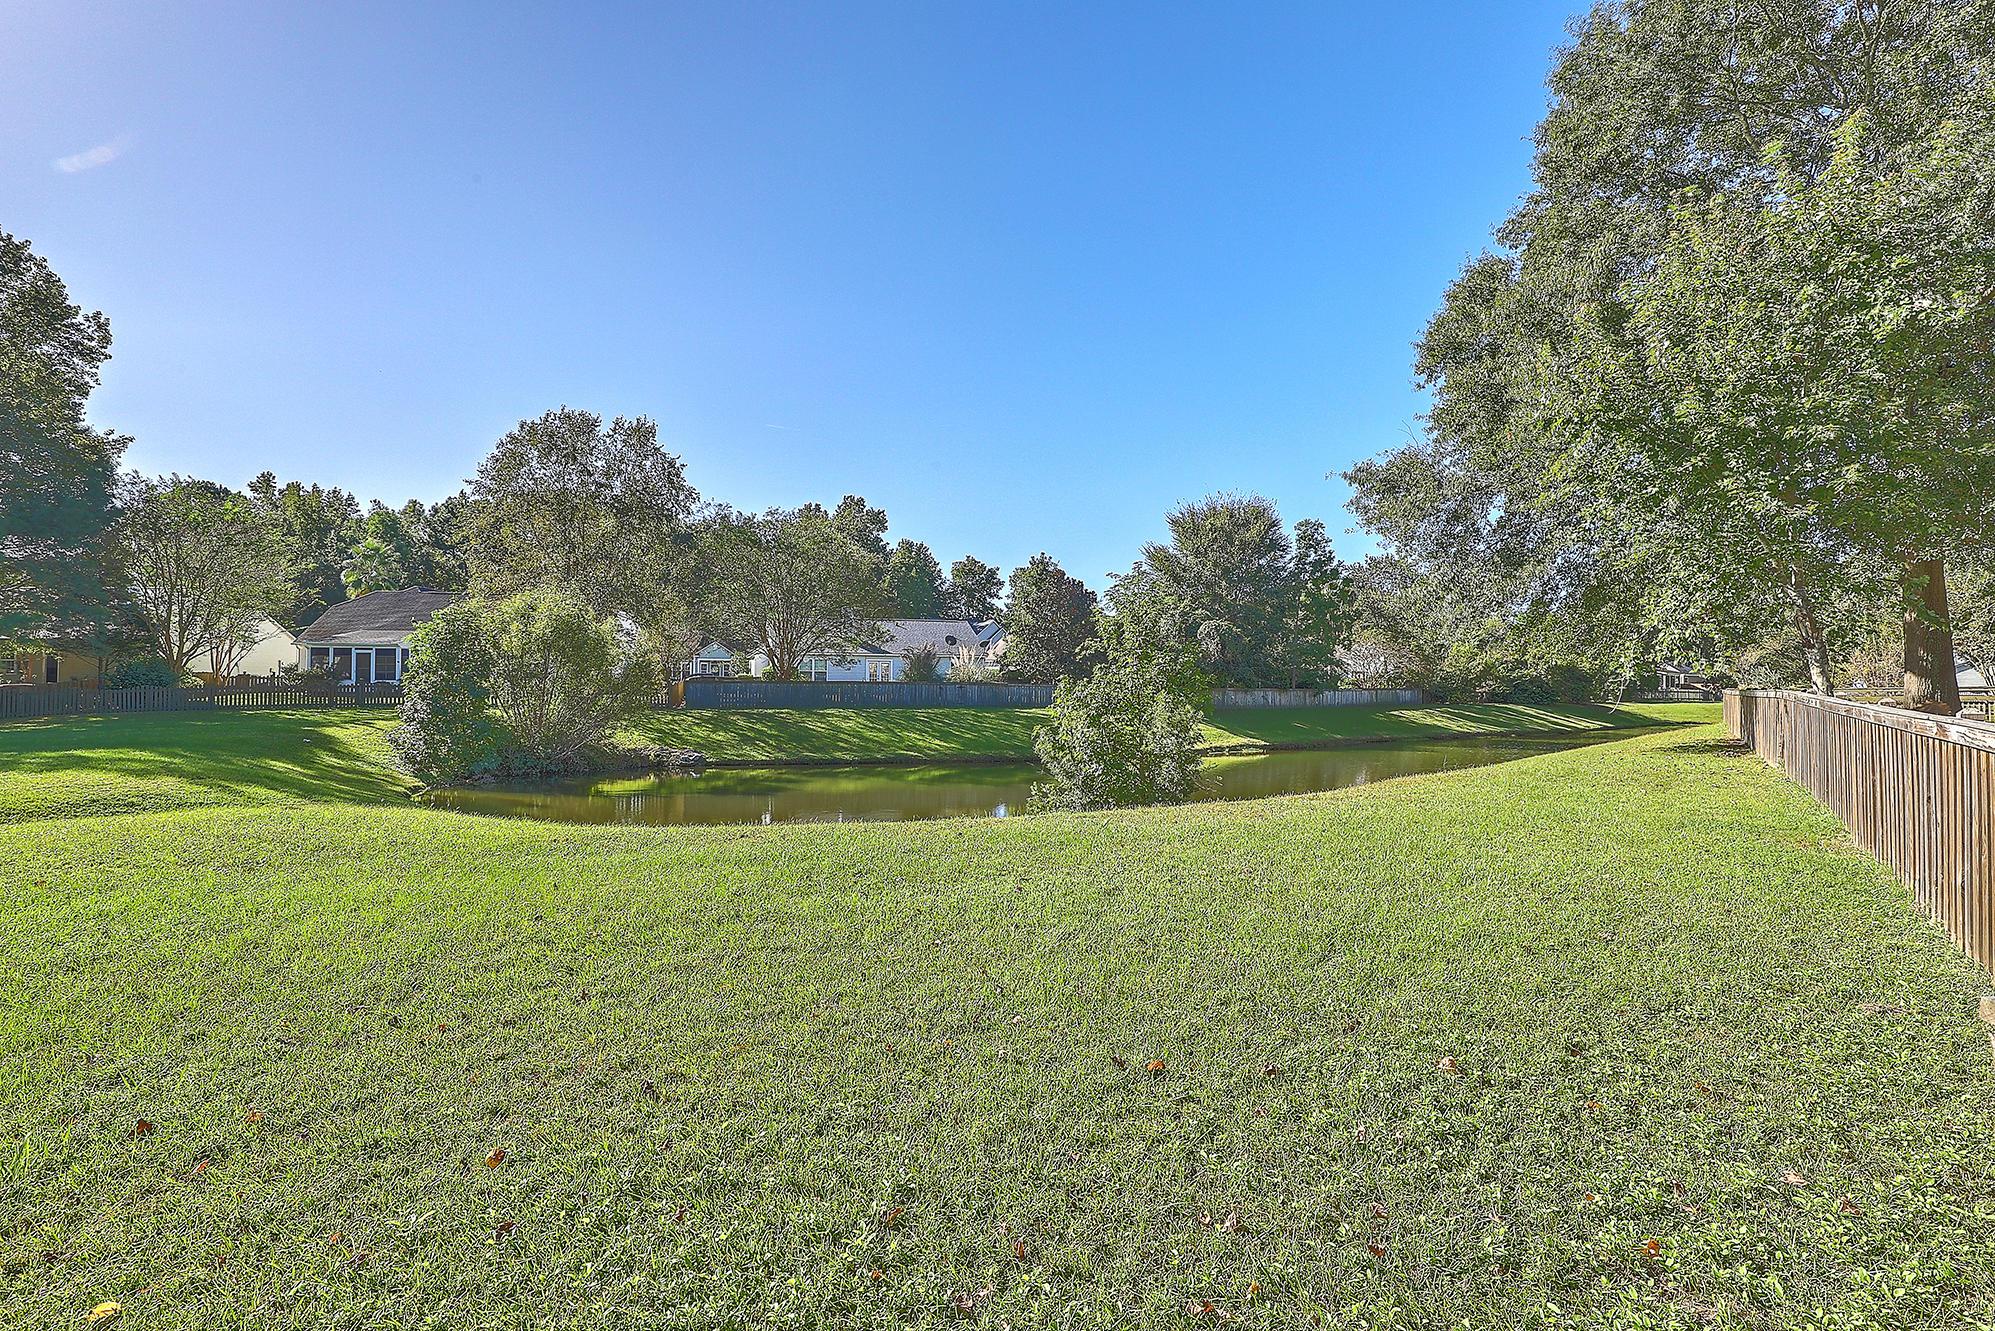 Planters Pointe Homes For Sale - 2740 Four Winds, Mount Pleasant, SC - 27